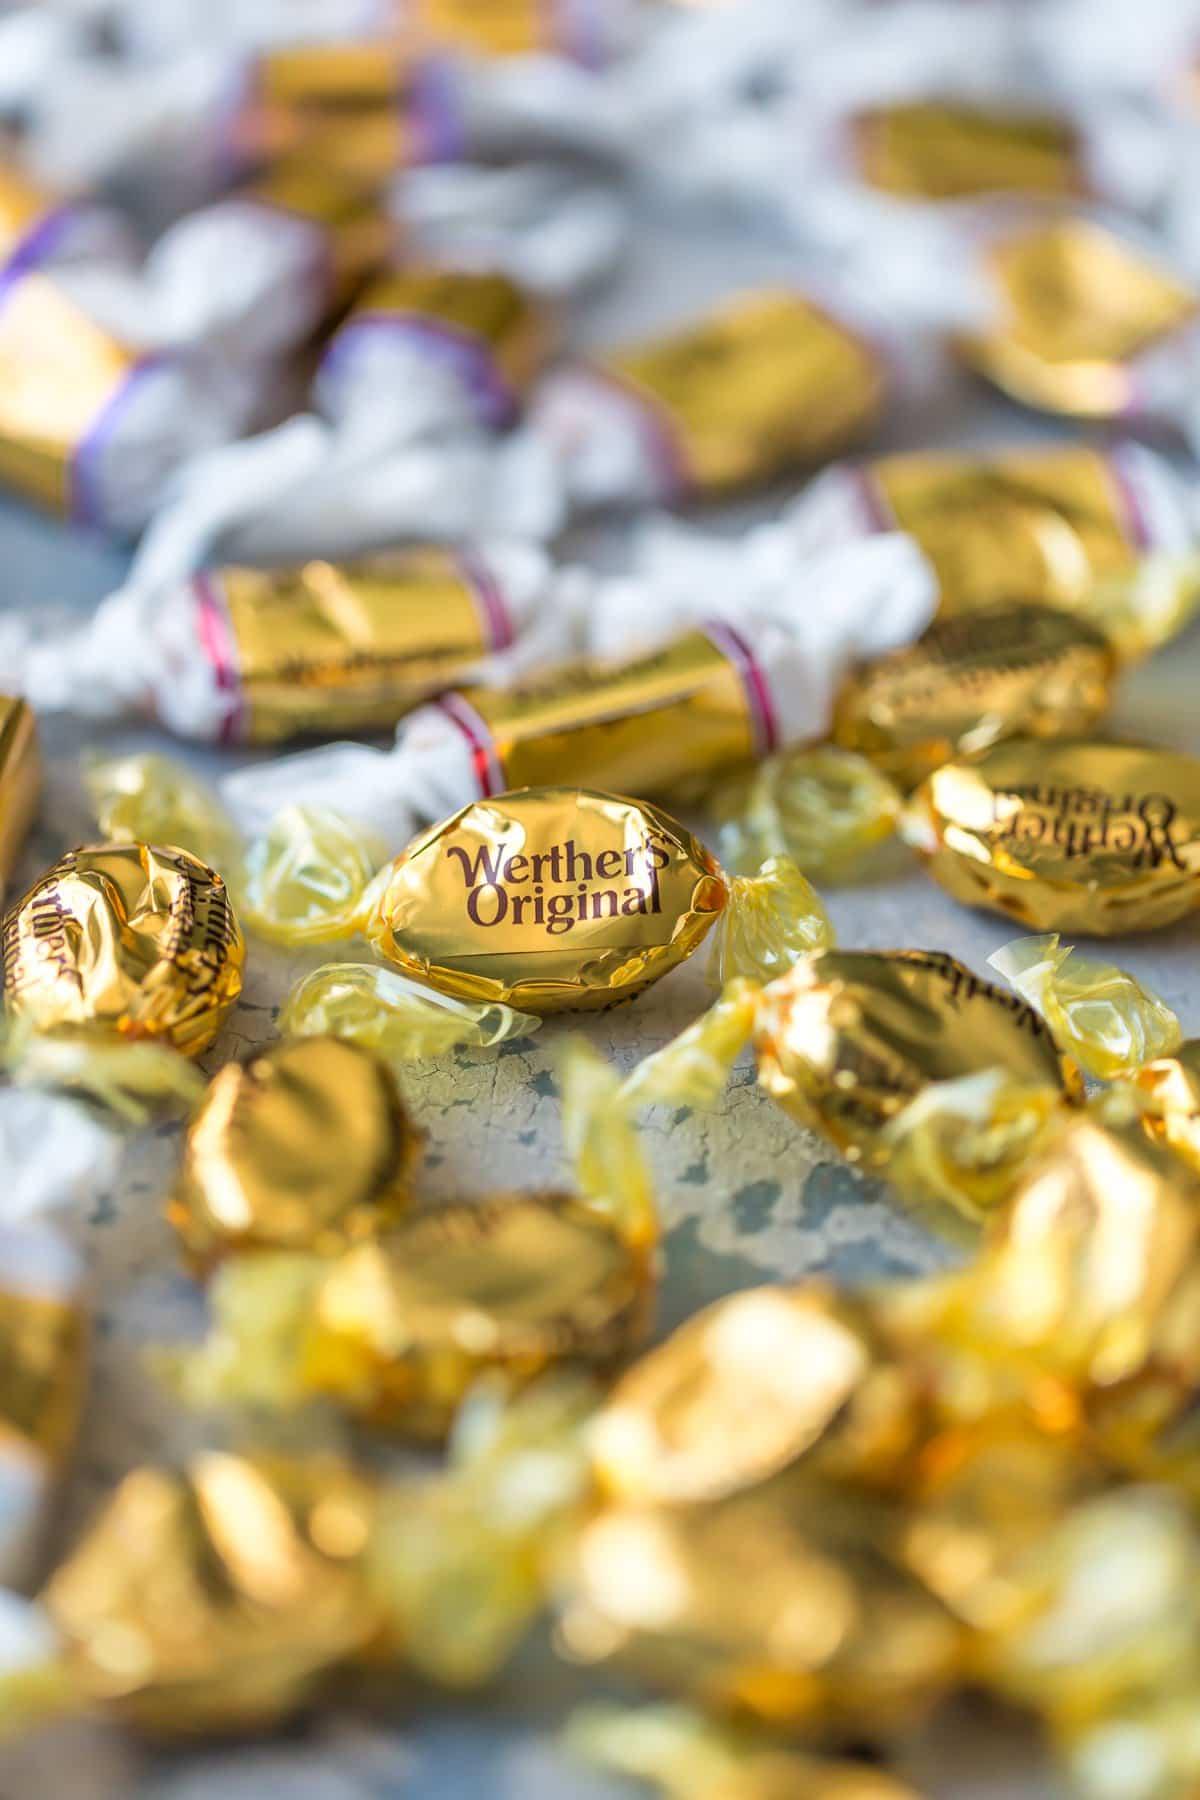 werthers origina wrappedl caramels